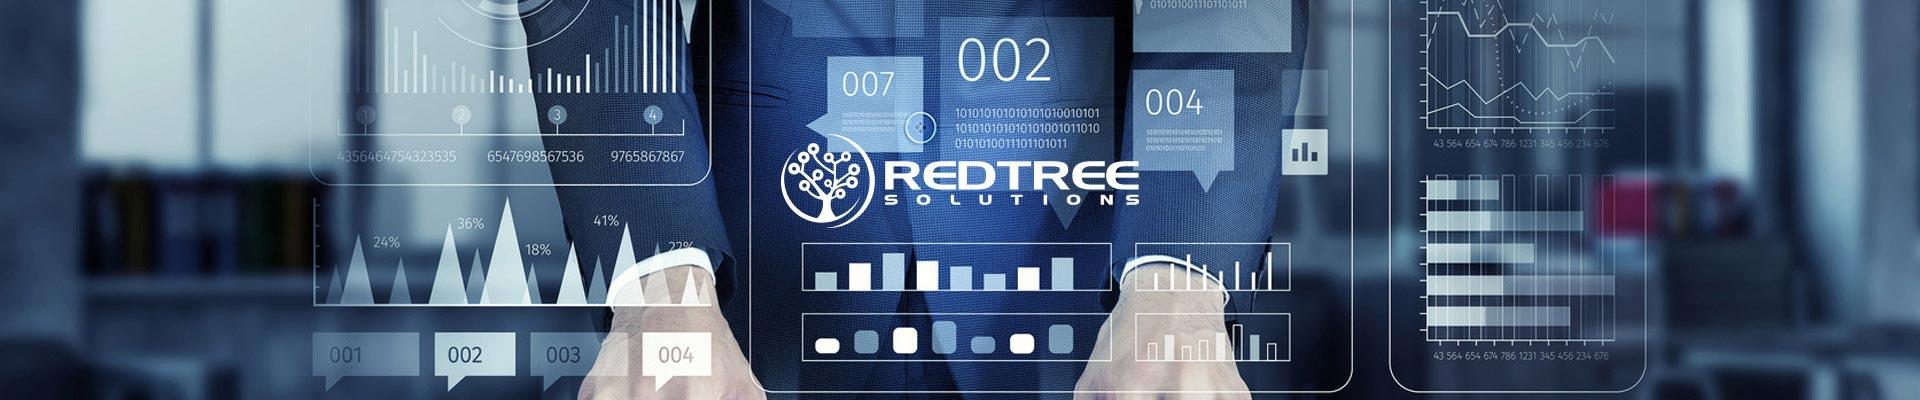 s-redtree-news